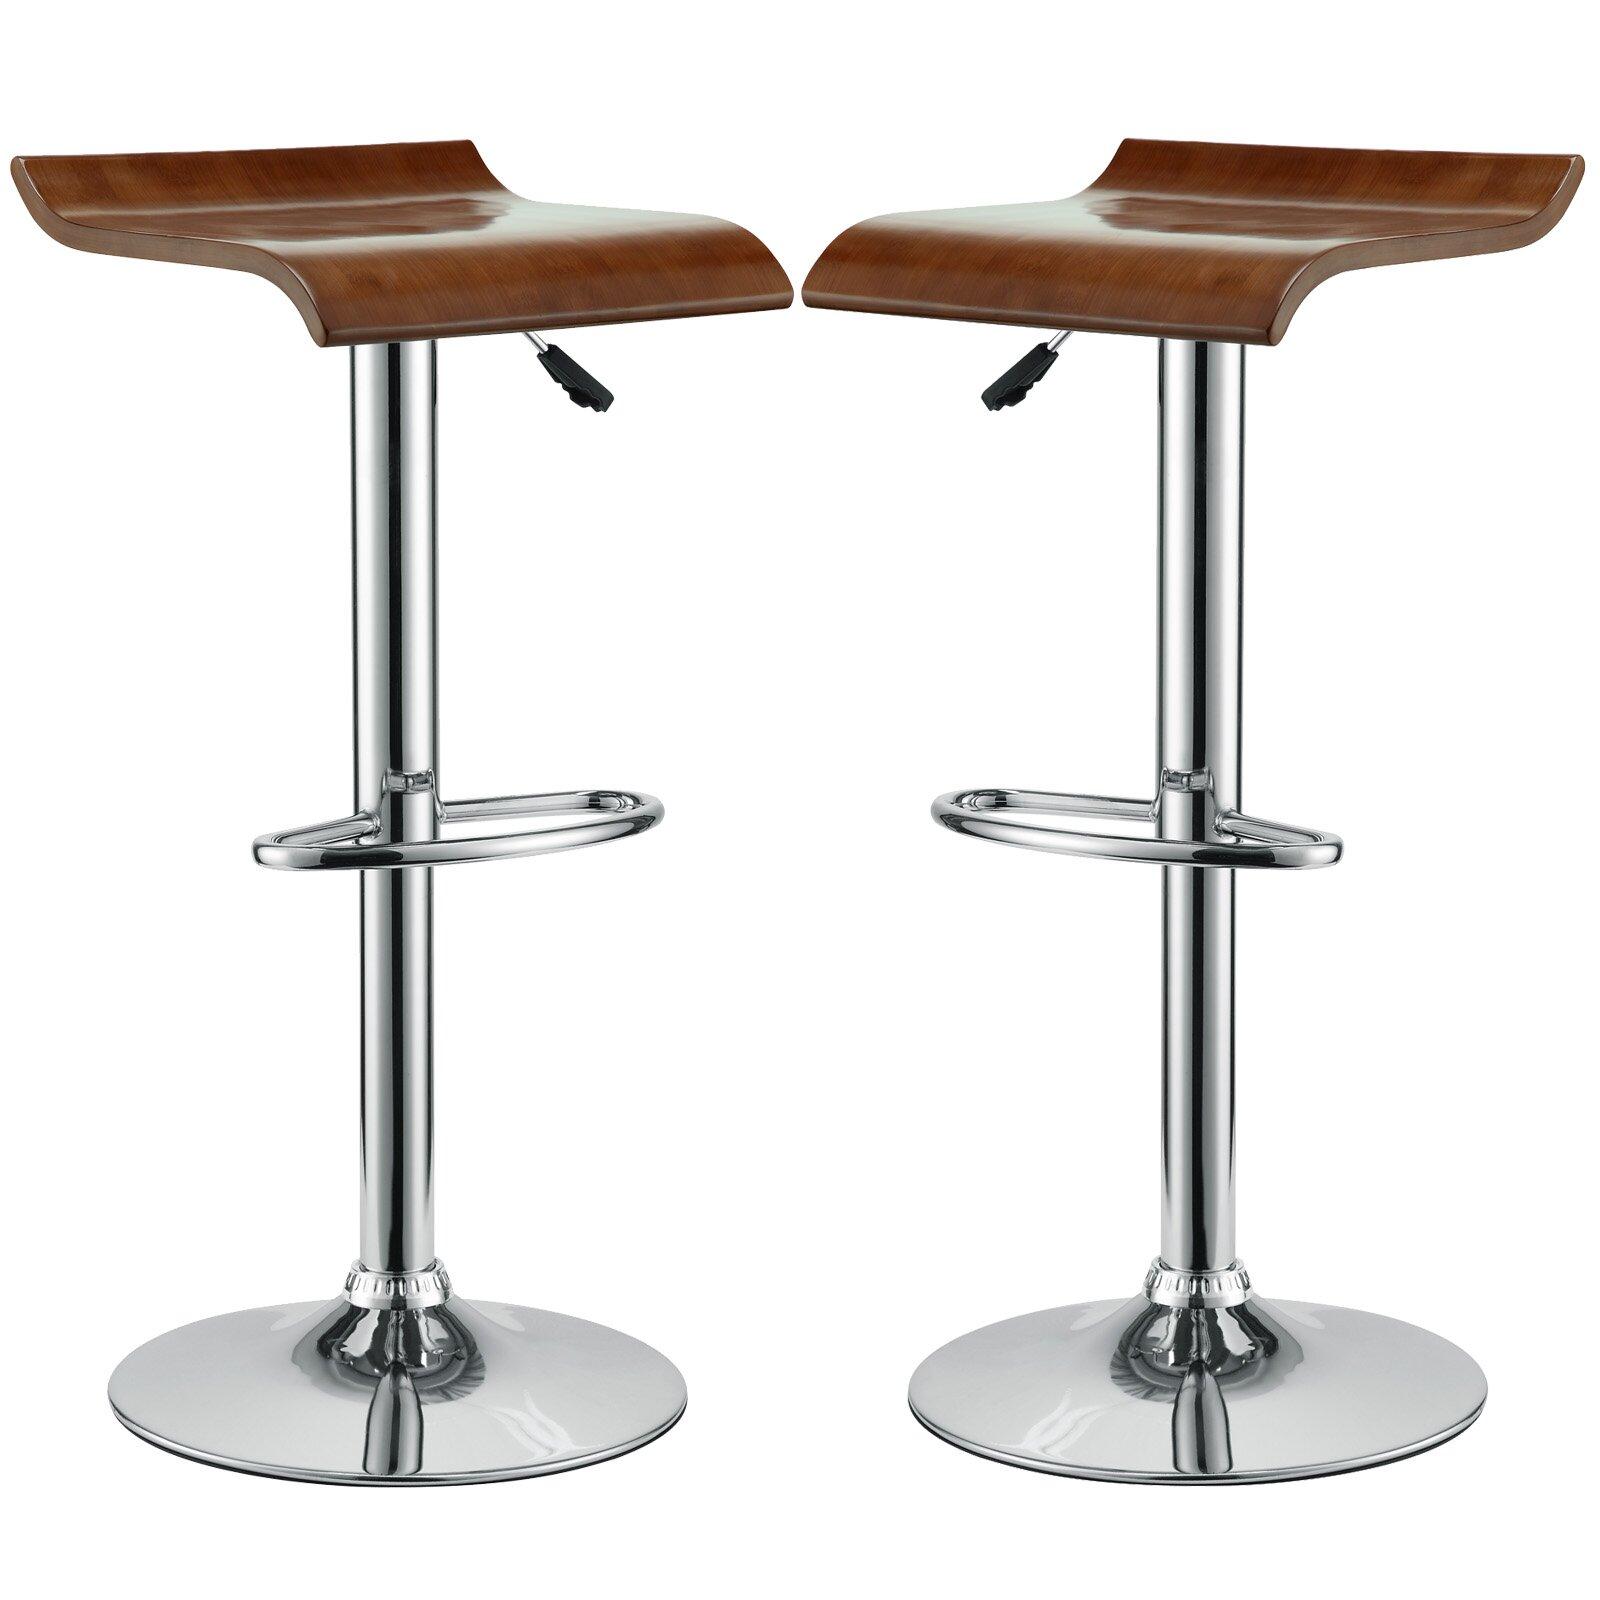 Modway Bentwood Adjustable Height Swivel Bar Stool